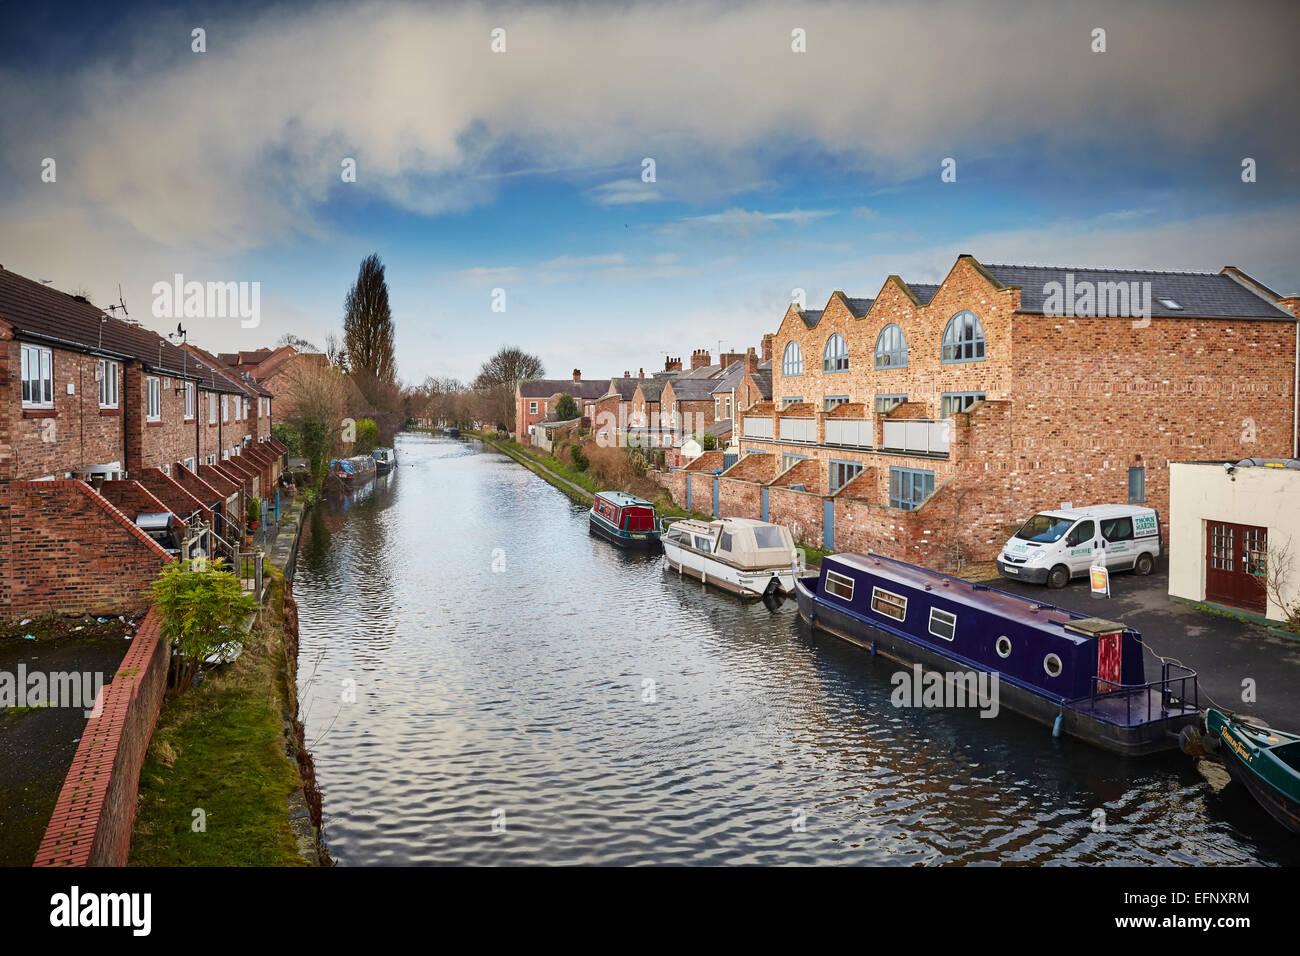 Stockton Heath civil parish suburb of Warrington, Cheshire, England UK . Housing on the Bridgewater Canal - Stock Image